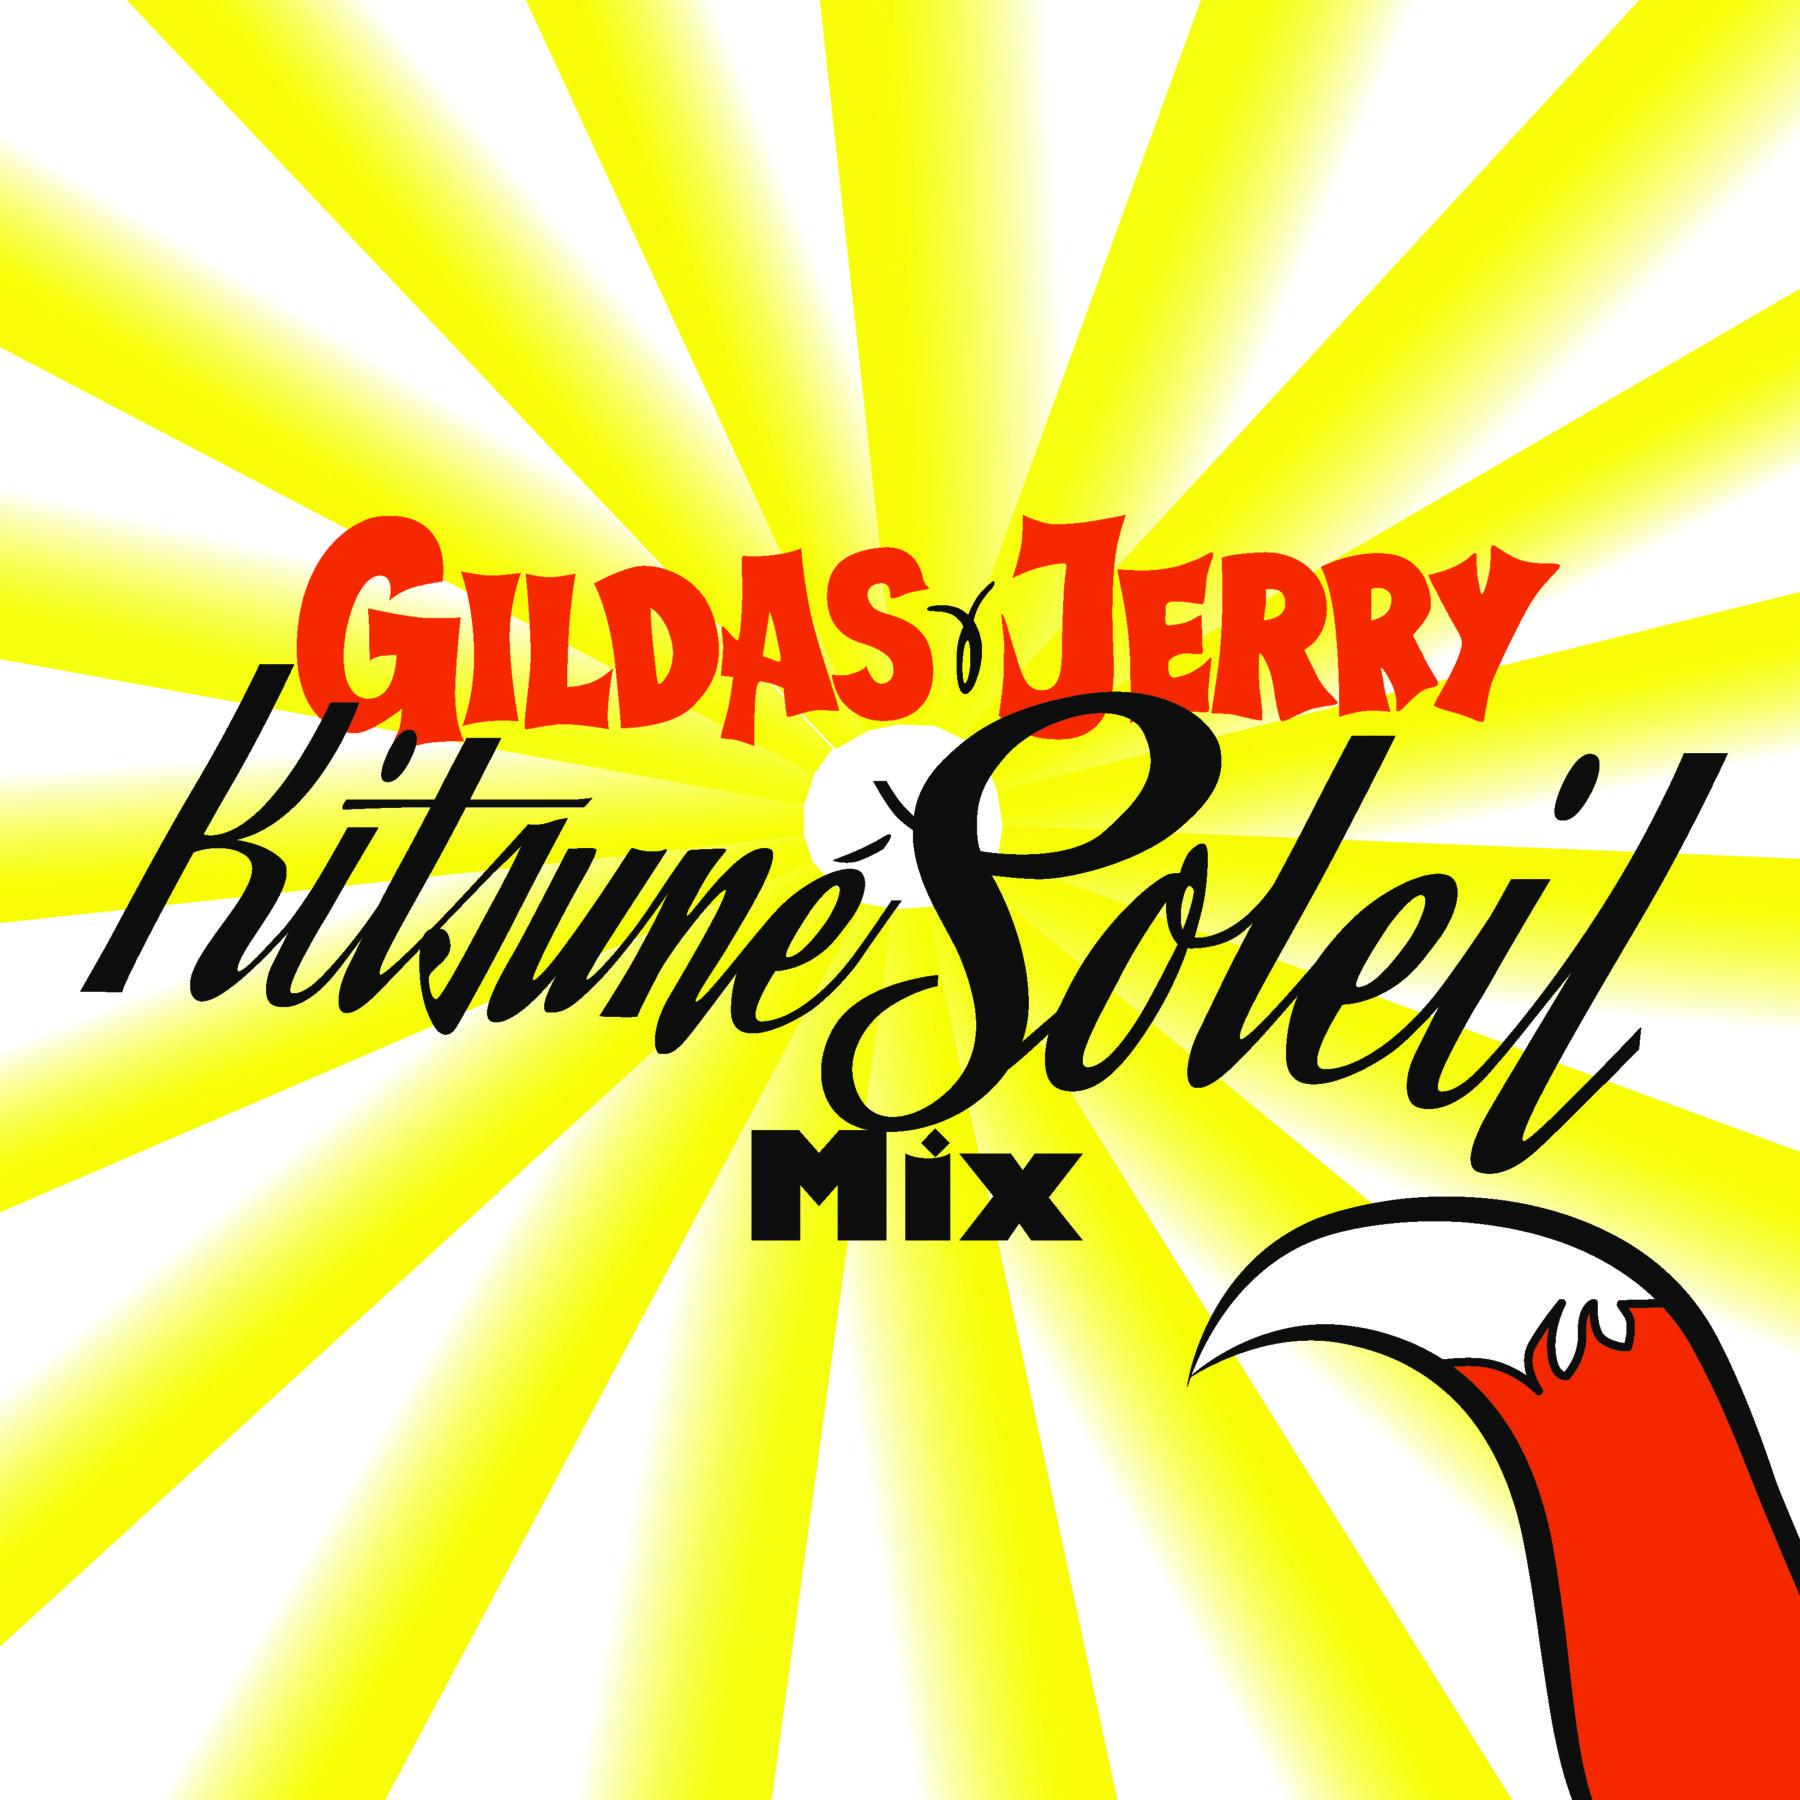 Kitsuné Soleil Mix